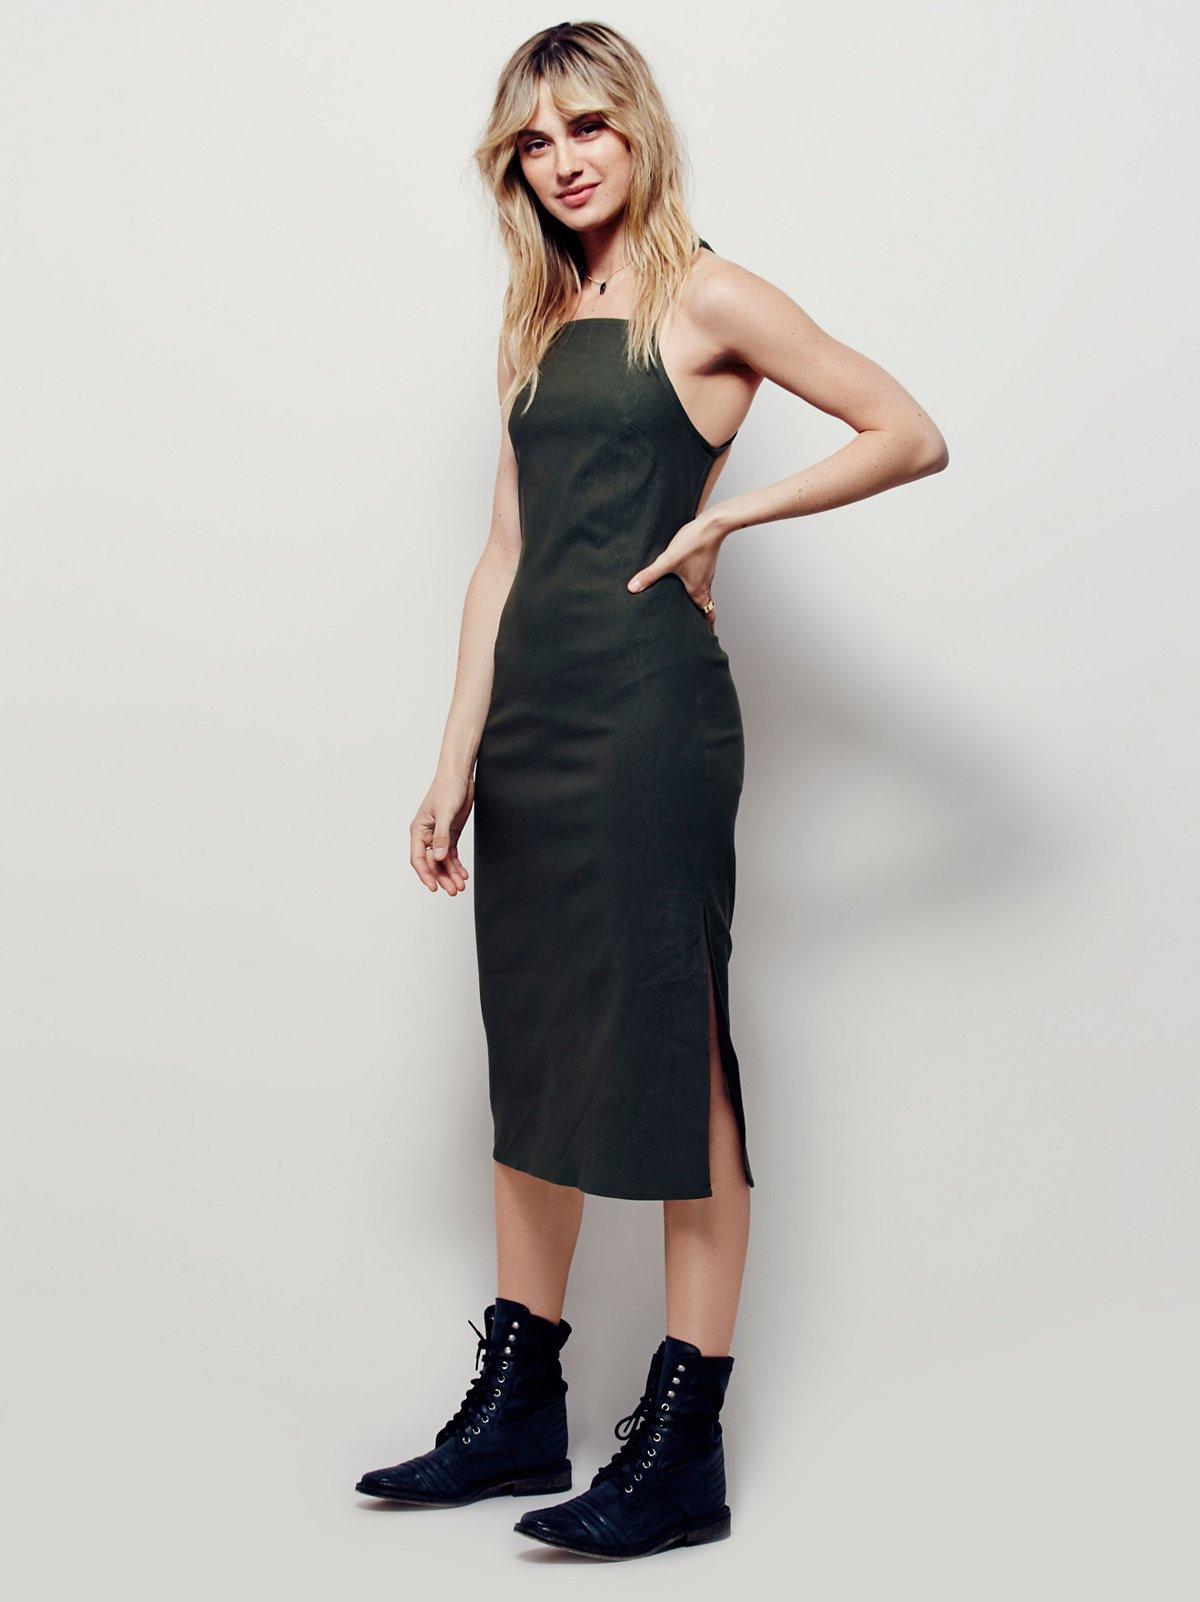 Stella连衣裙